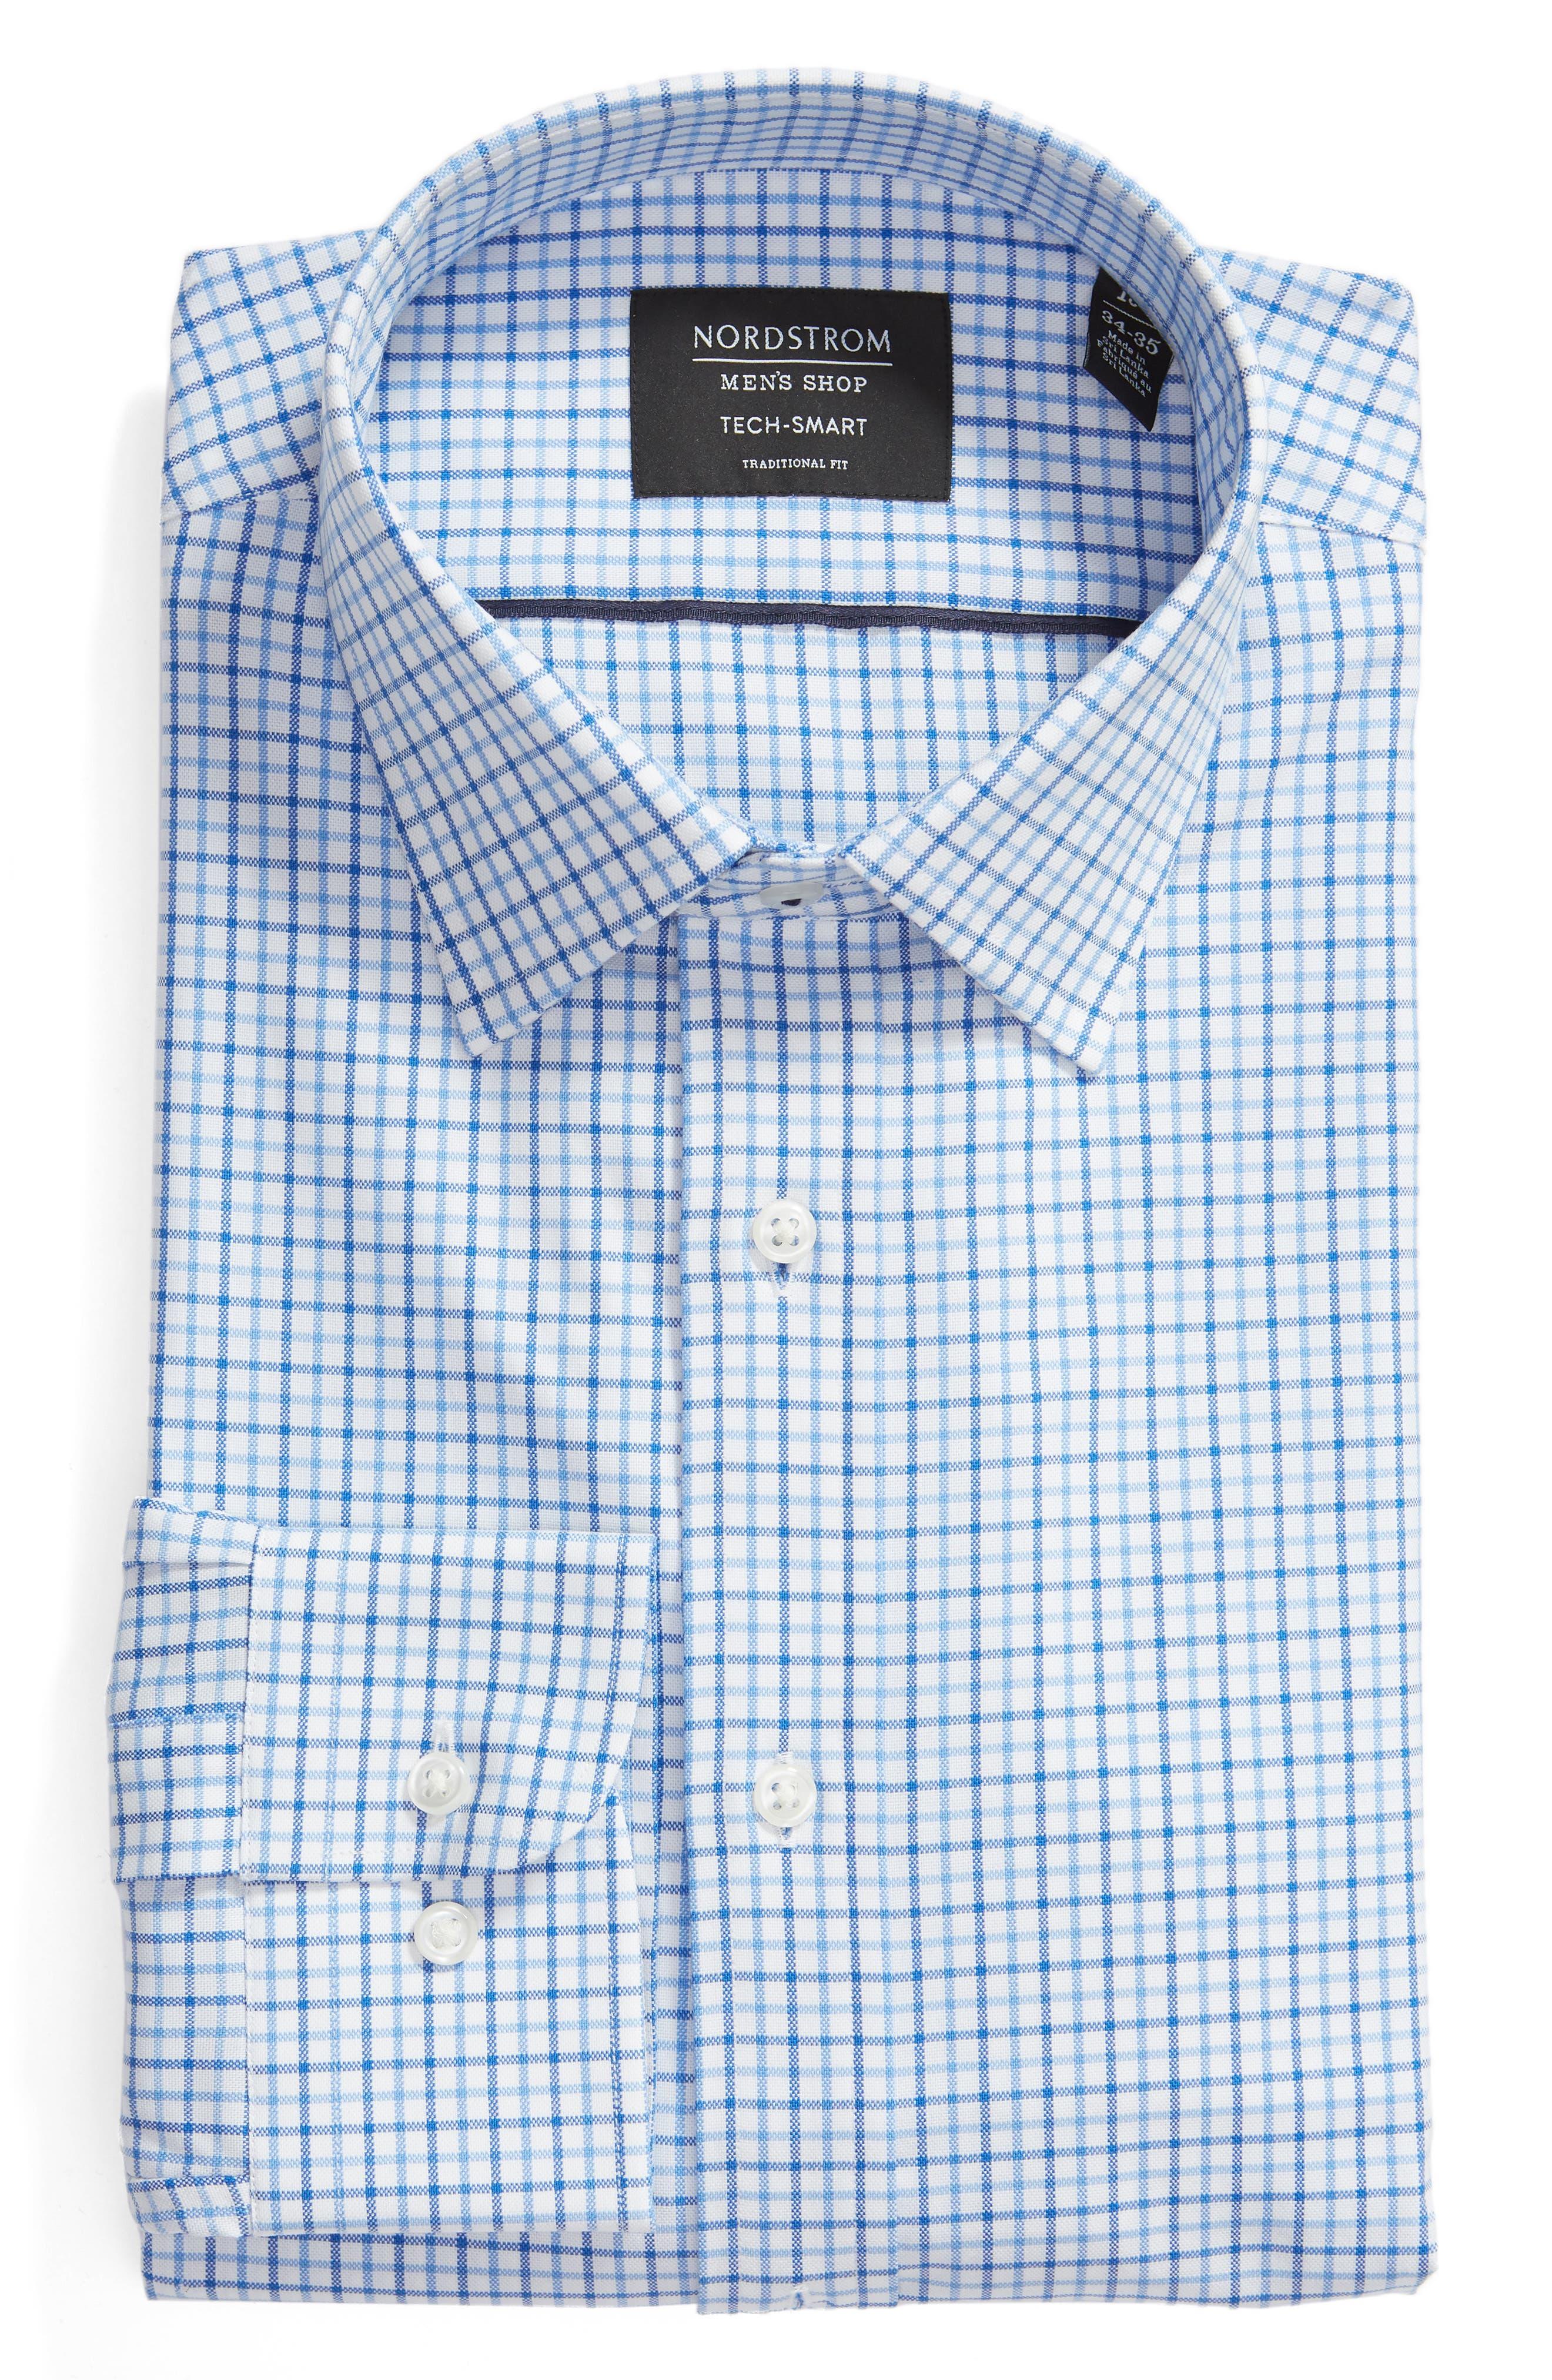 NORDSTROM MEN'S SHOP,                             Tech-Smart Traditional Fit Check Stretch Dress Shirt,                             Alternate thumbnail 5, color,                             BLUE VICTORIA